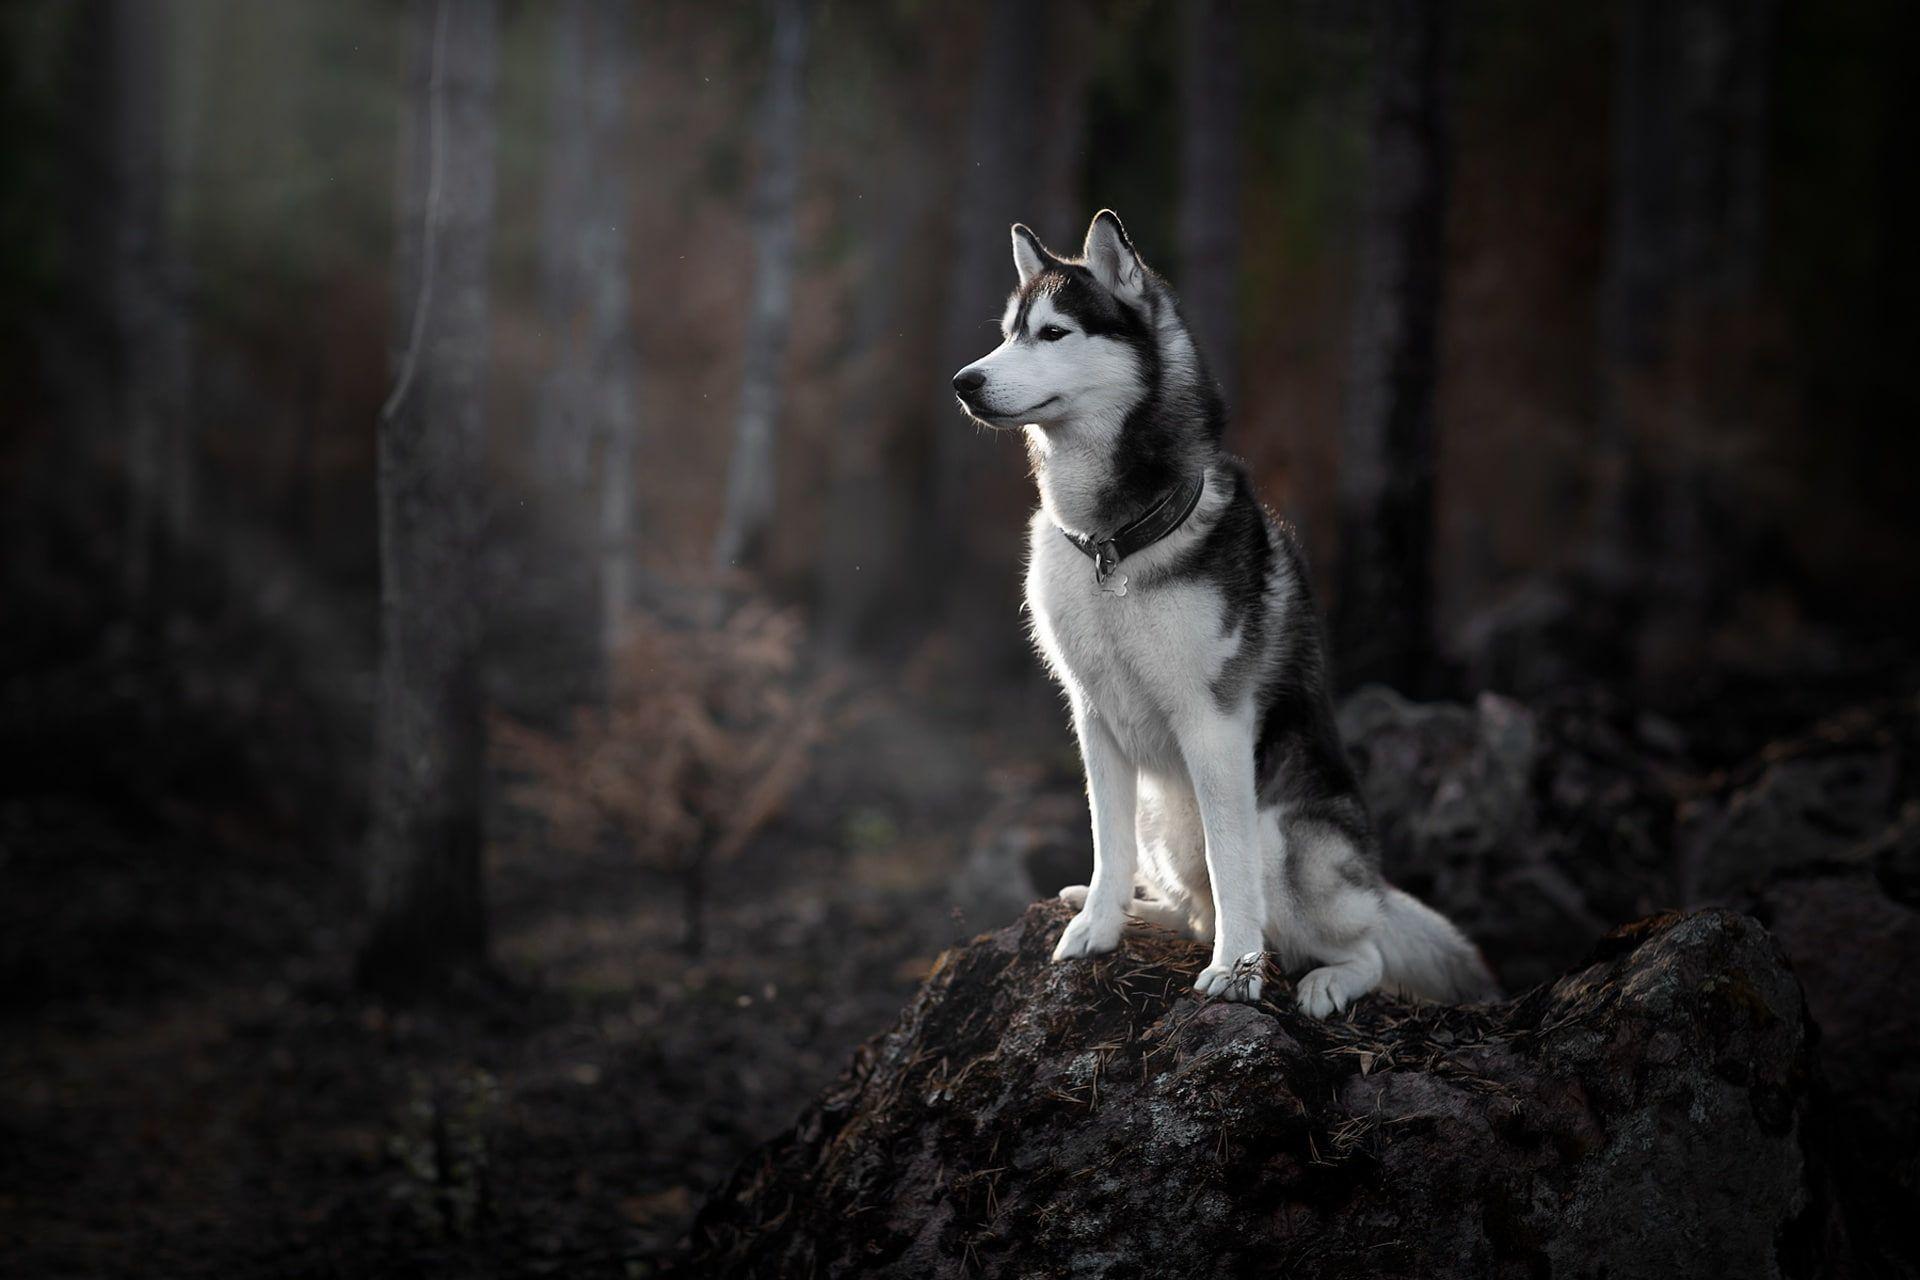 Forest Dog Husky 1080p Wallpaper Hdwallpaper Desktop In 2020 Husky Grey Dog Dogs